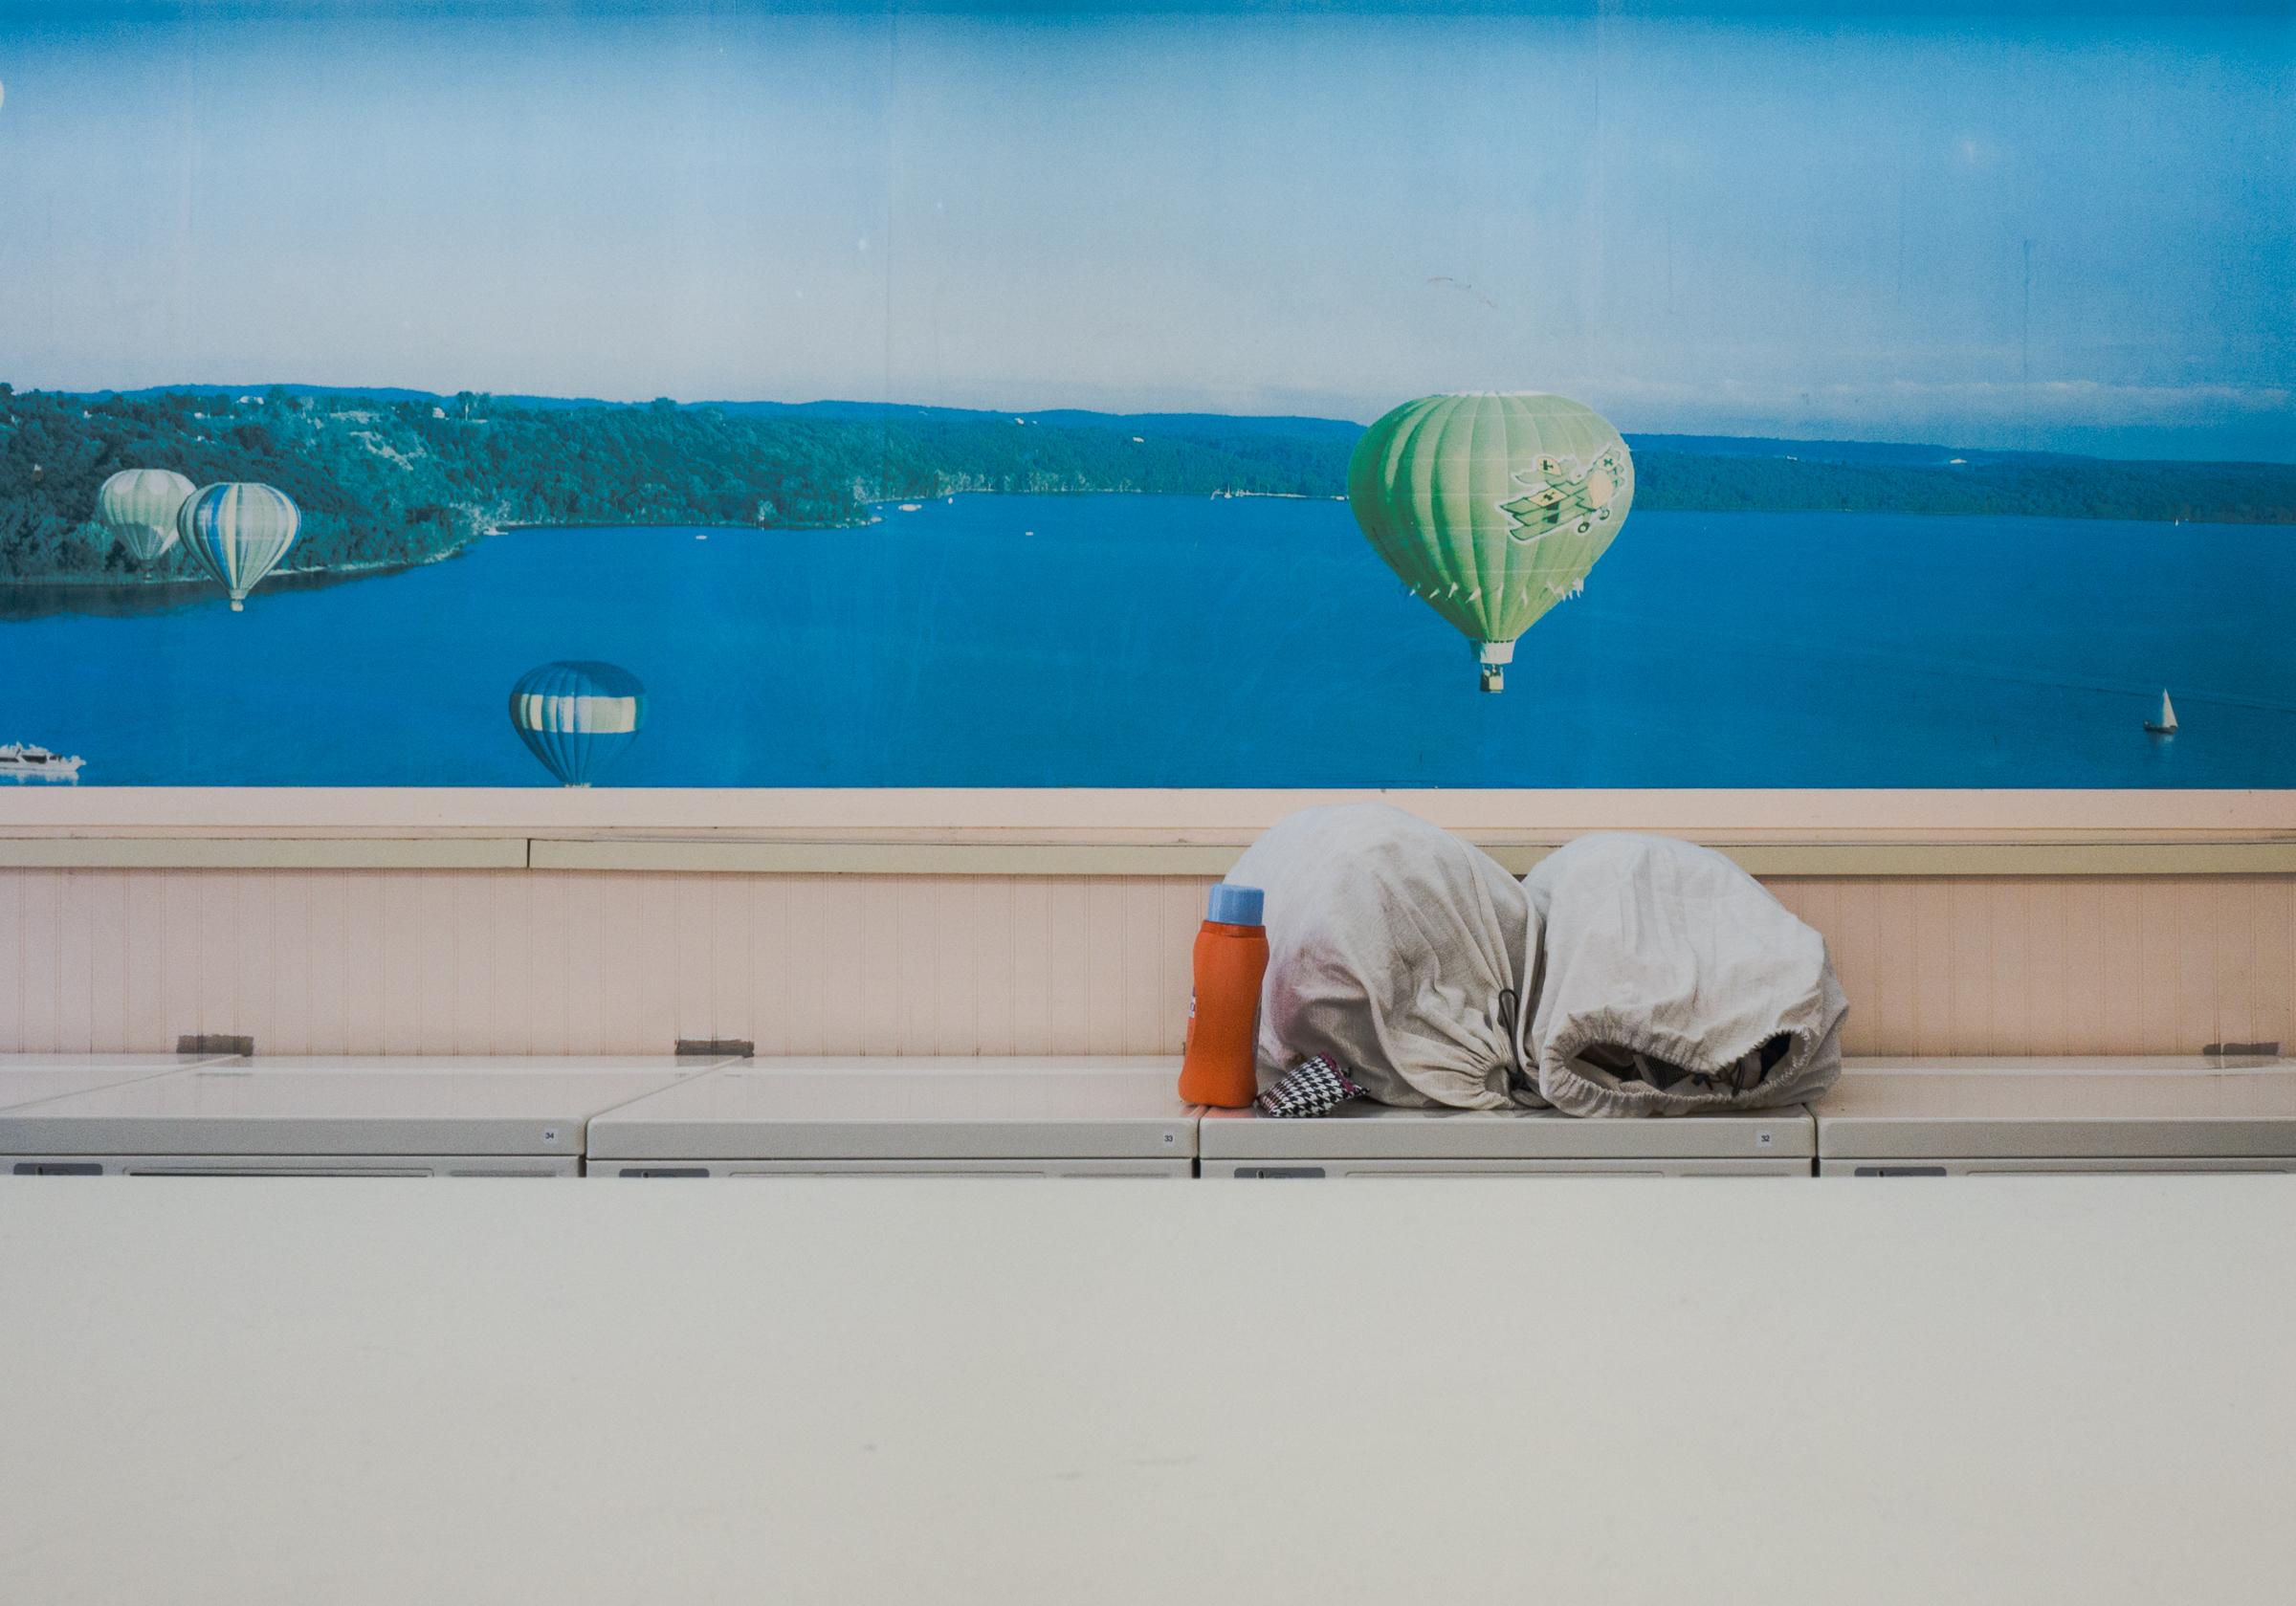 Philip Sager, Ballooning